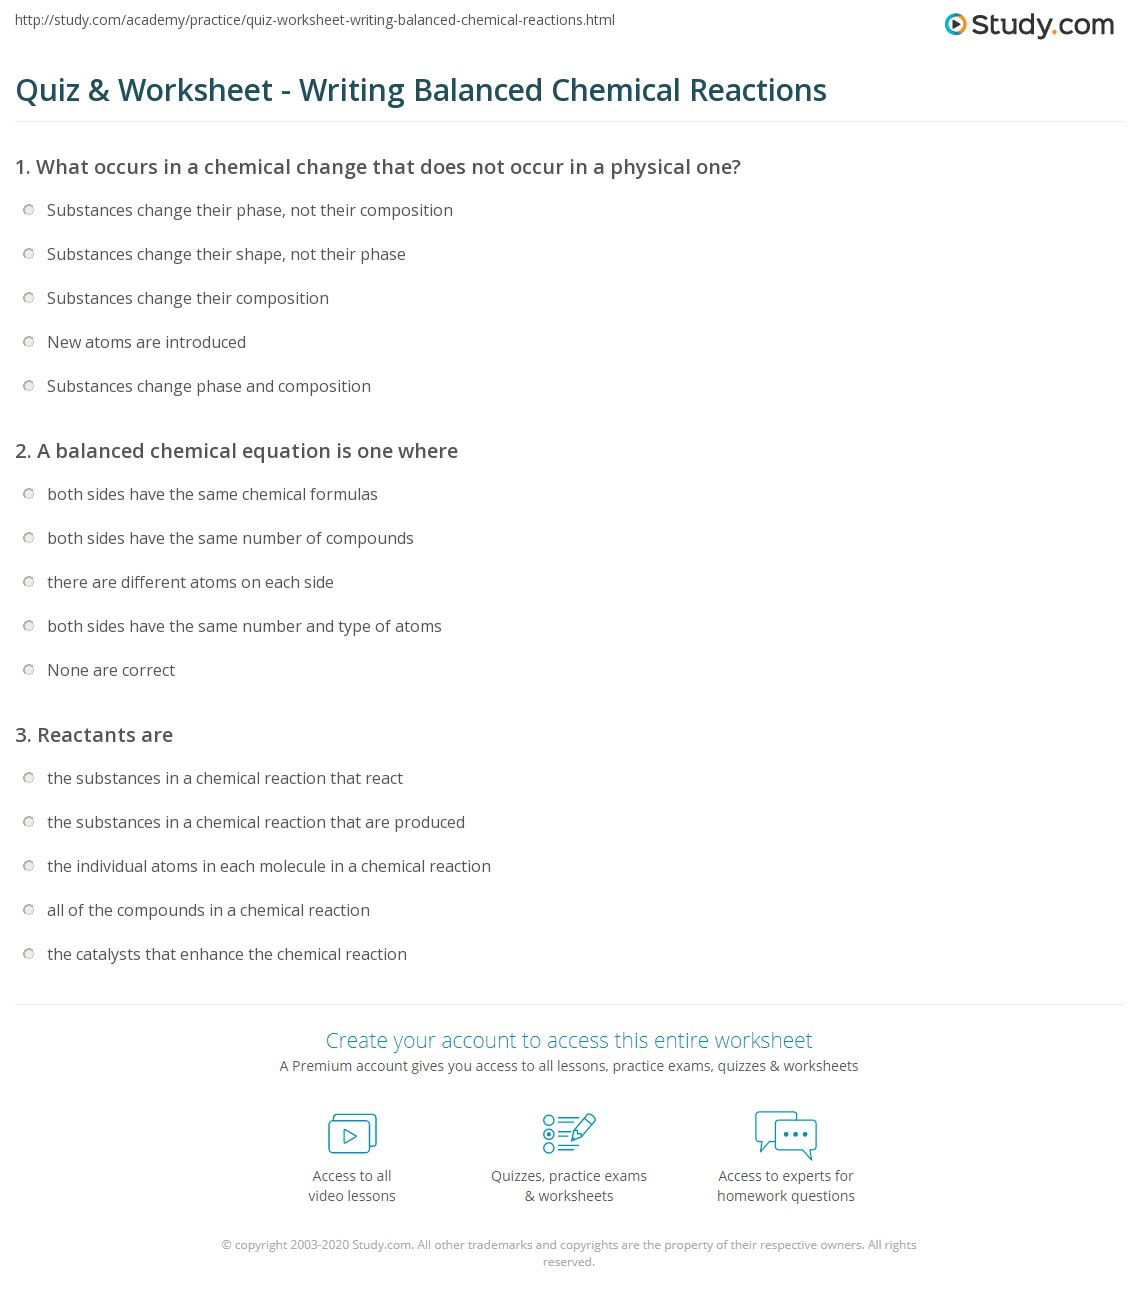 Quiz & Worksheet - Writing Balanced Chemical Reactions | Study.com